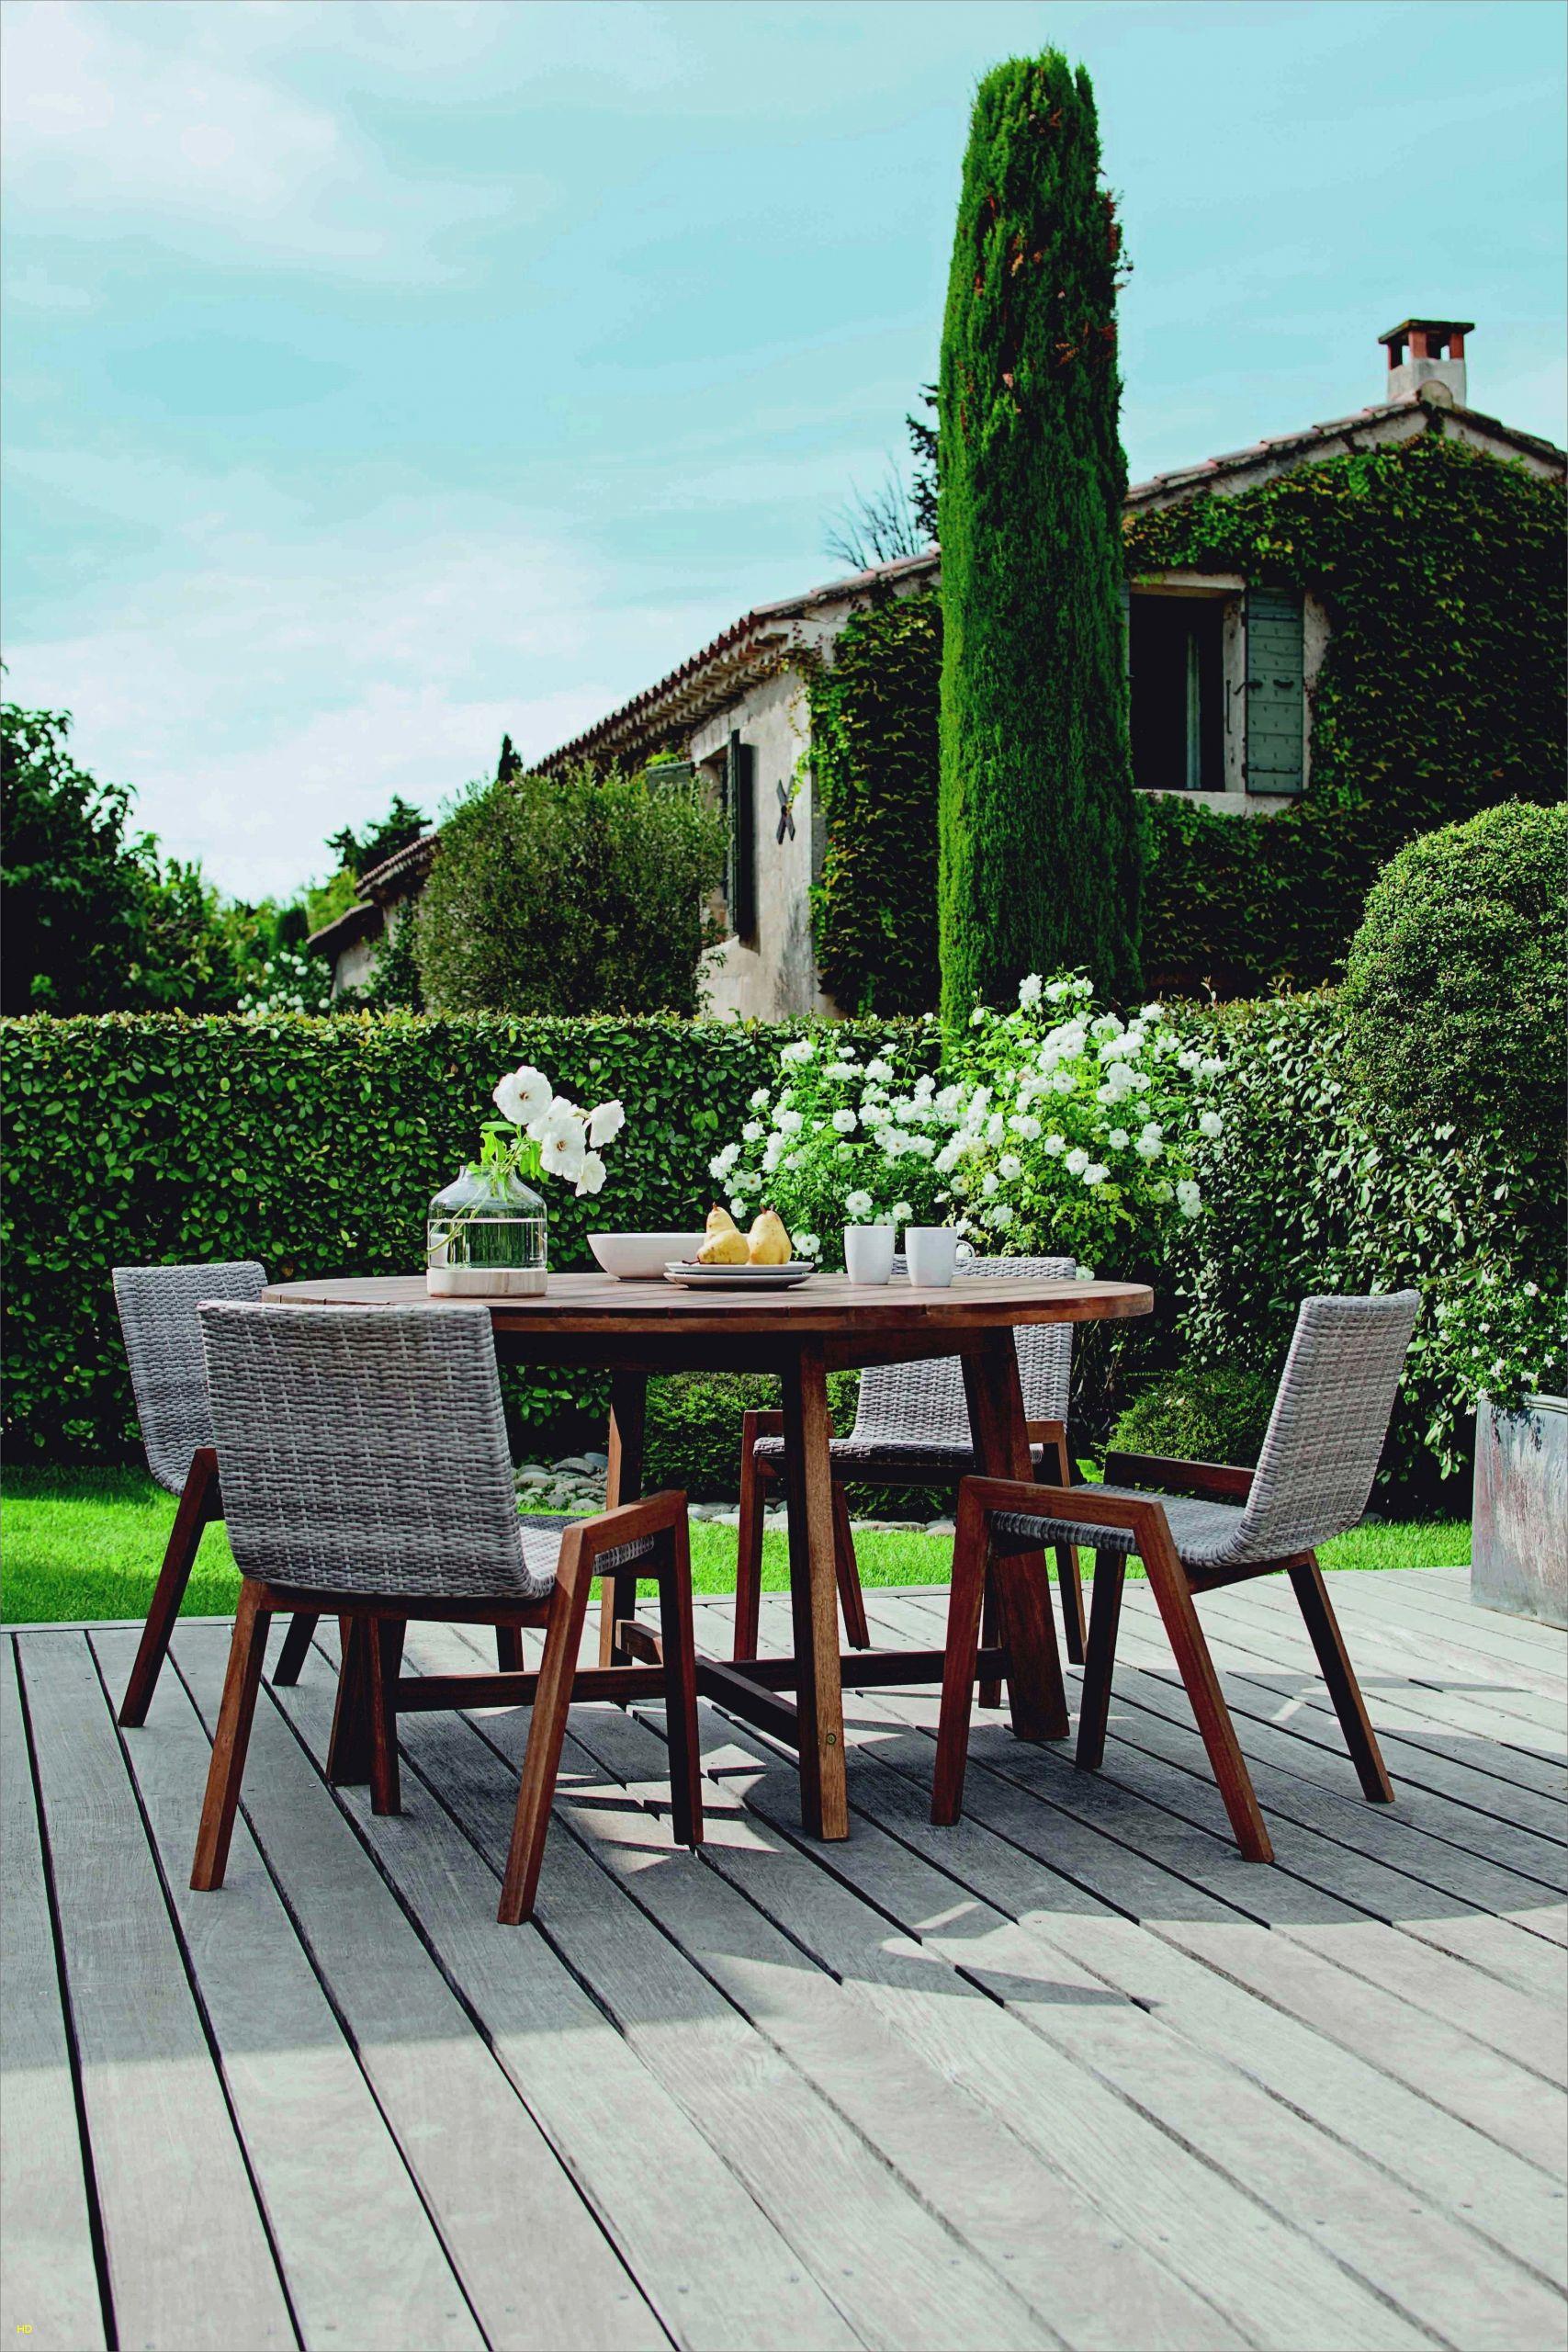 Solde Salon Jardin Best Of Salon De Jardin Leclerc Catalogue ... tout Leclerc Mobilier De Jardin